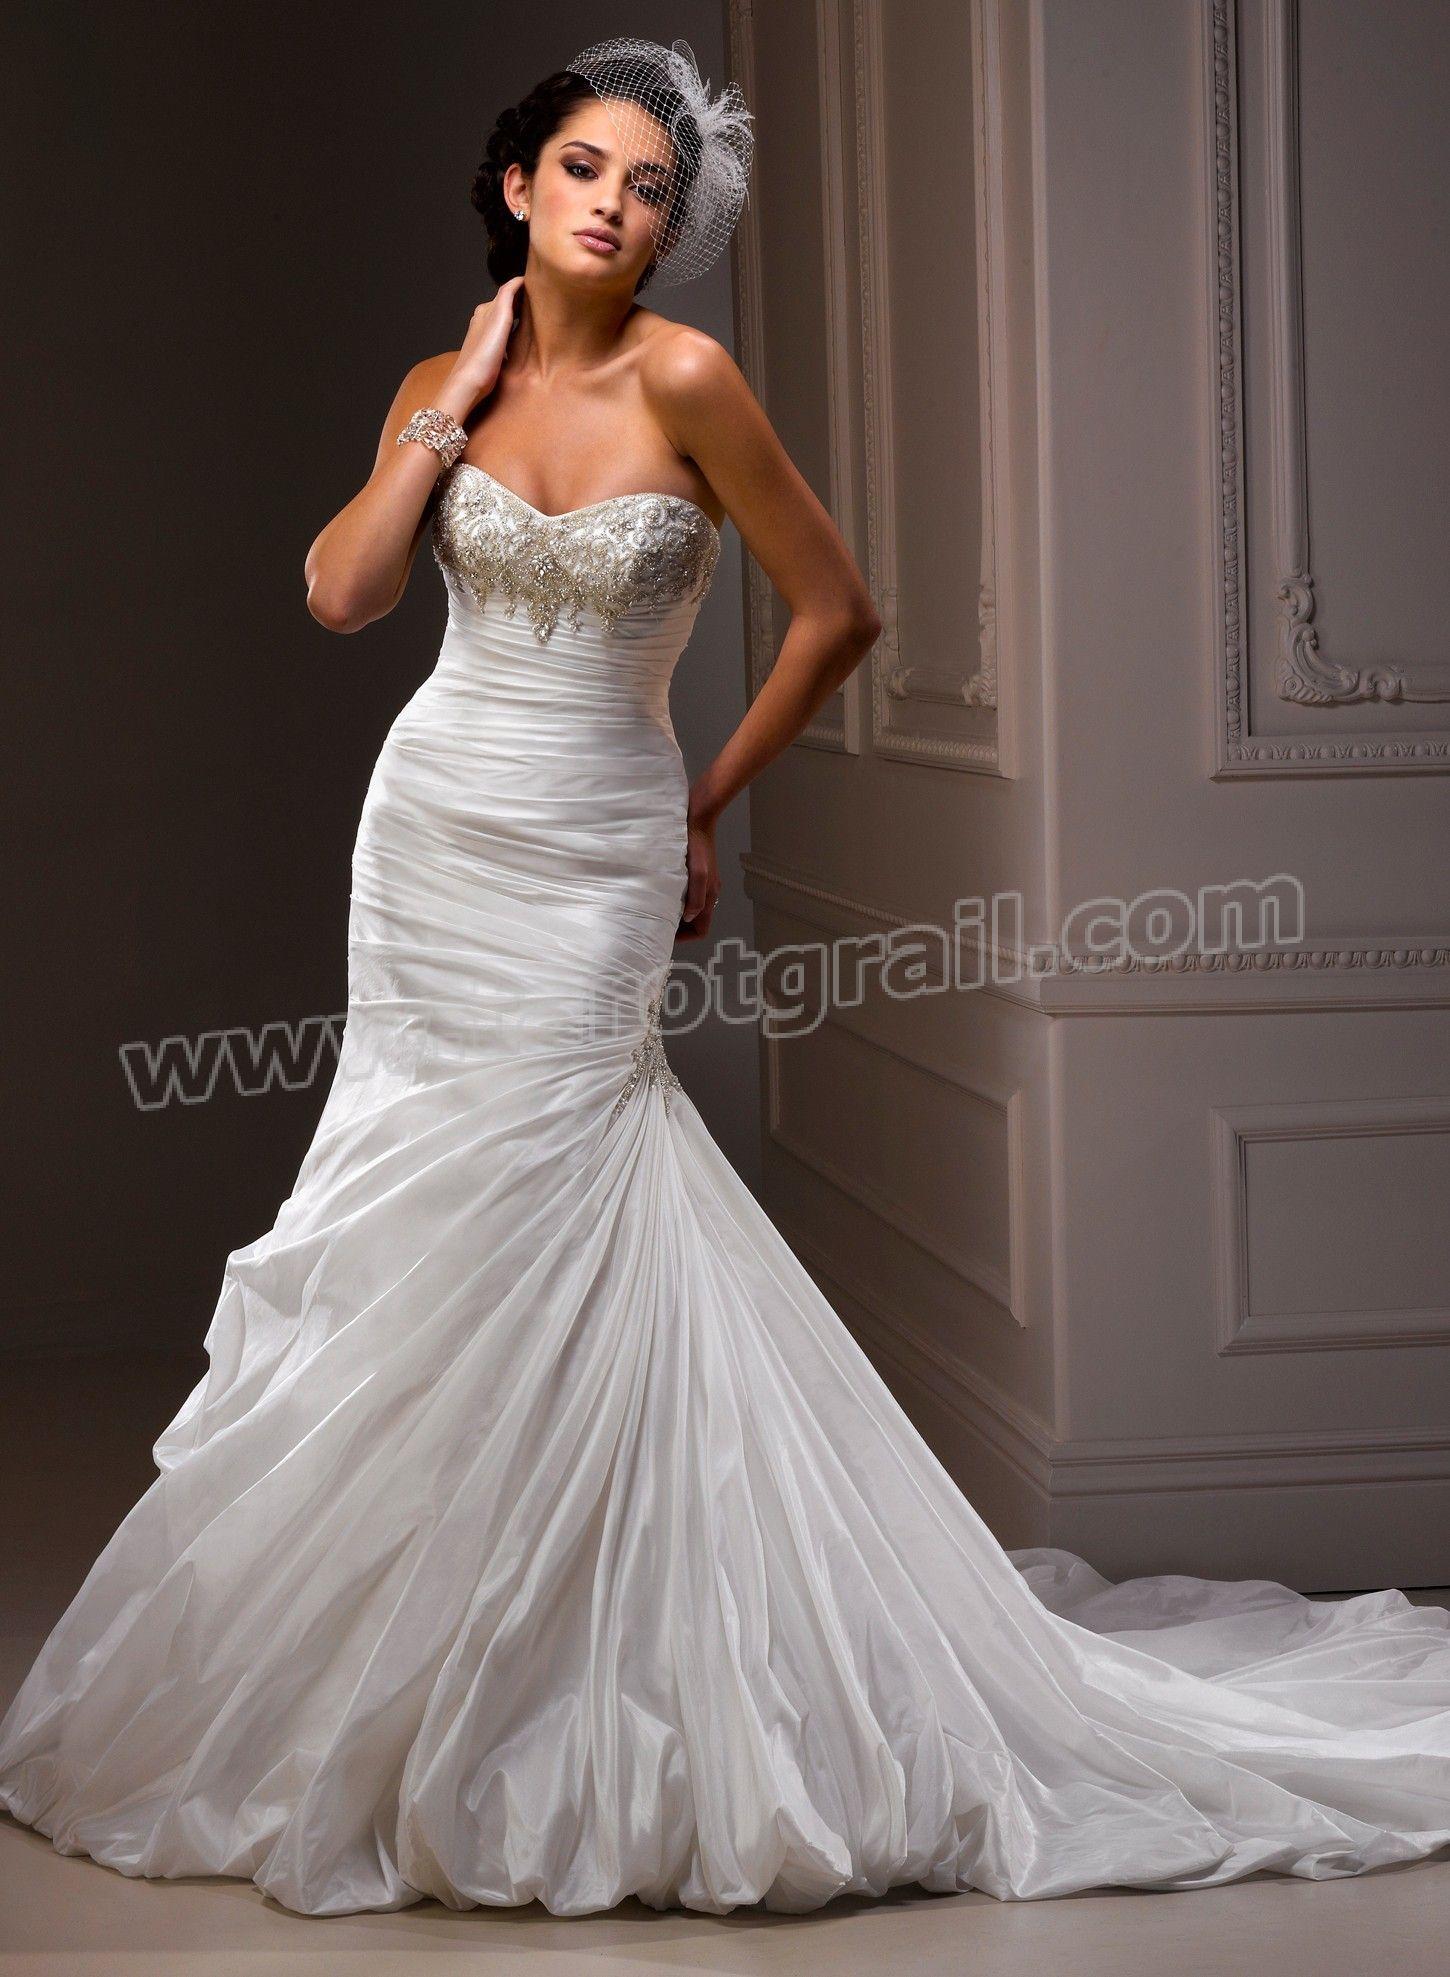 Bordeaux Taffeta Strapless Neckline Fit And Flare A-line Wedding Dress